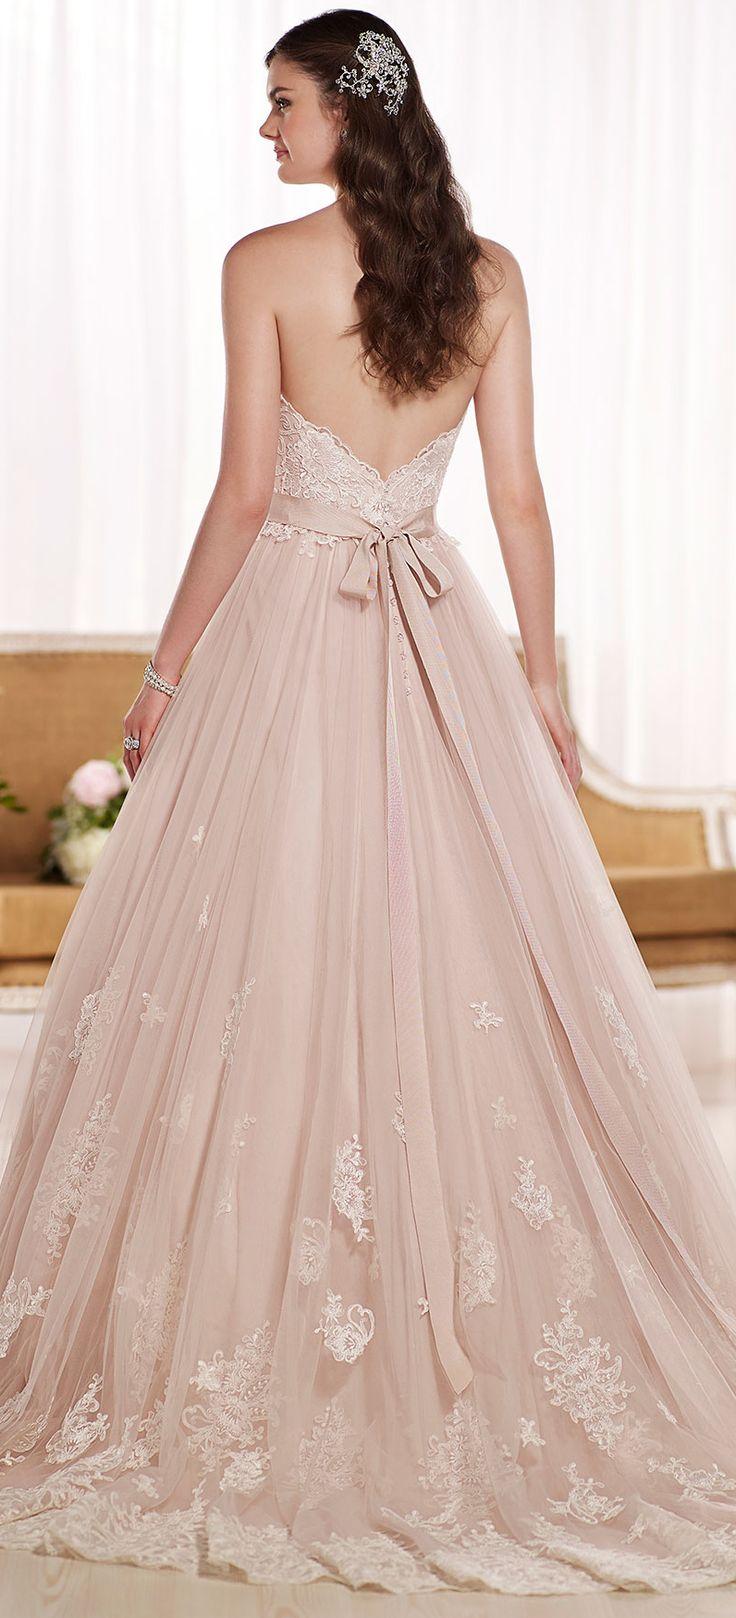 121 best Wedding Dress images on Pinterest | Weddings, Bridal gowns ...